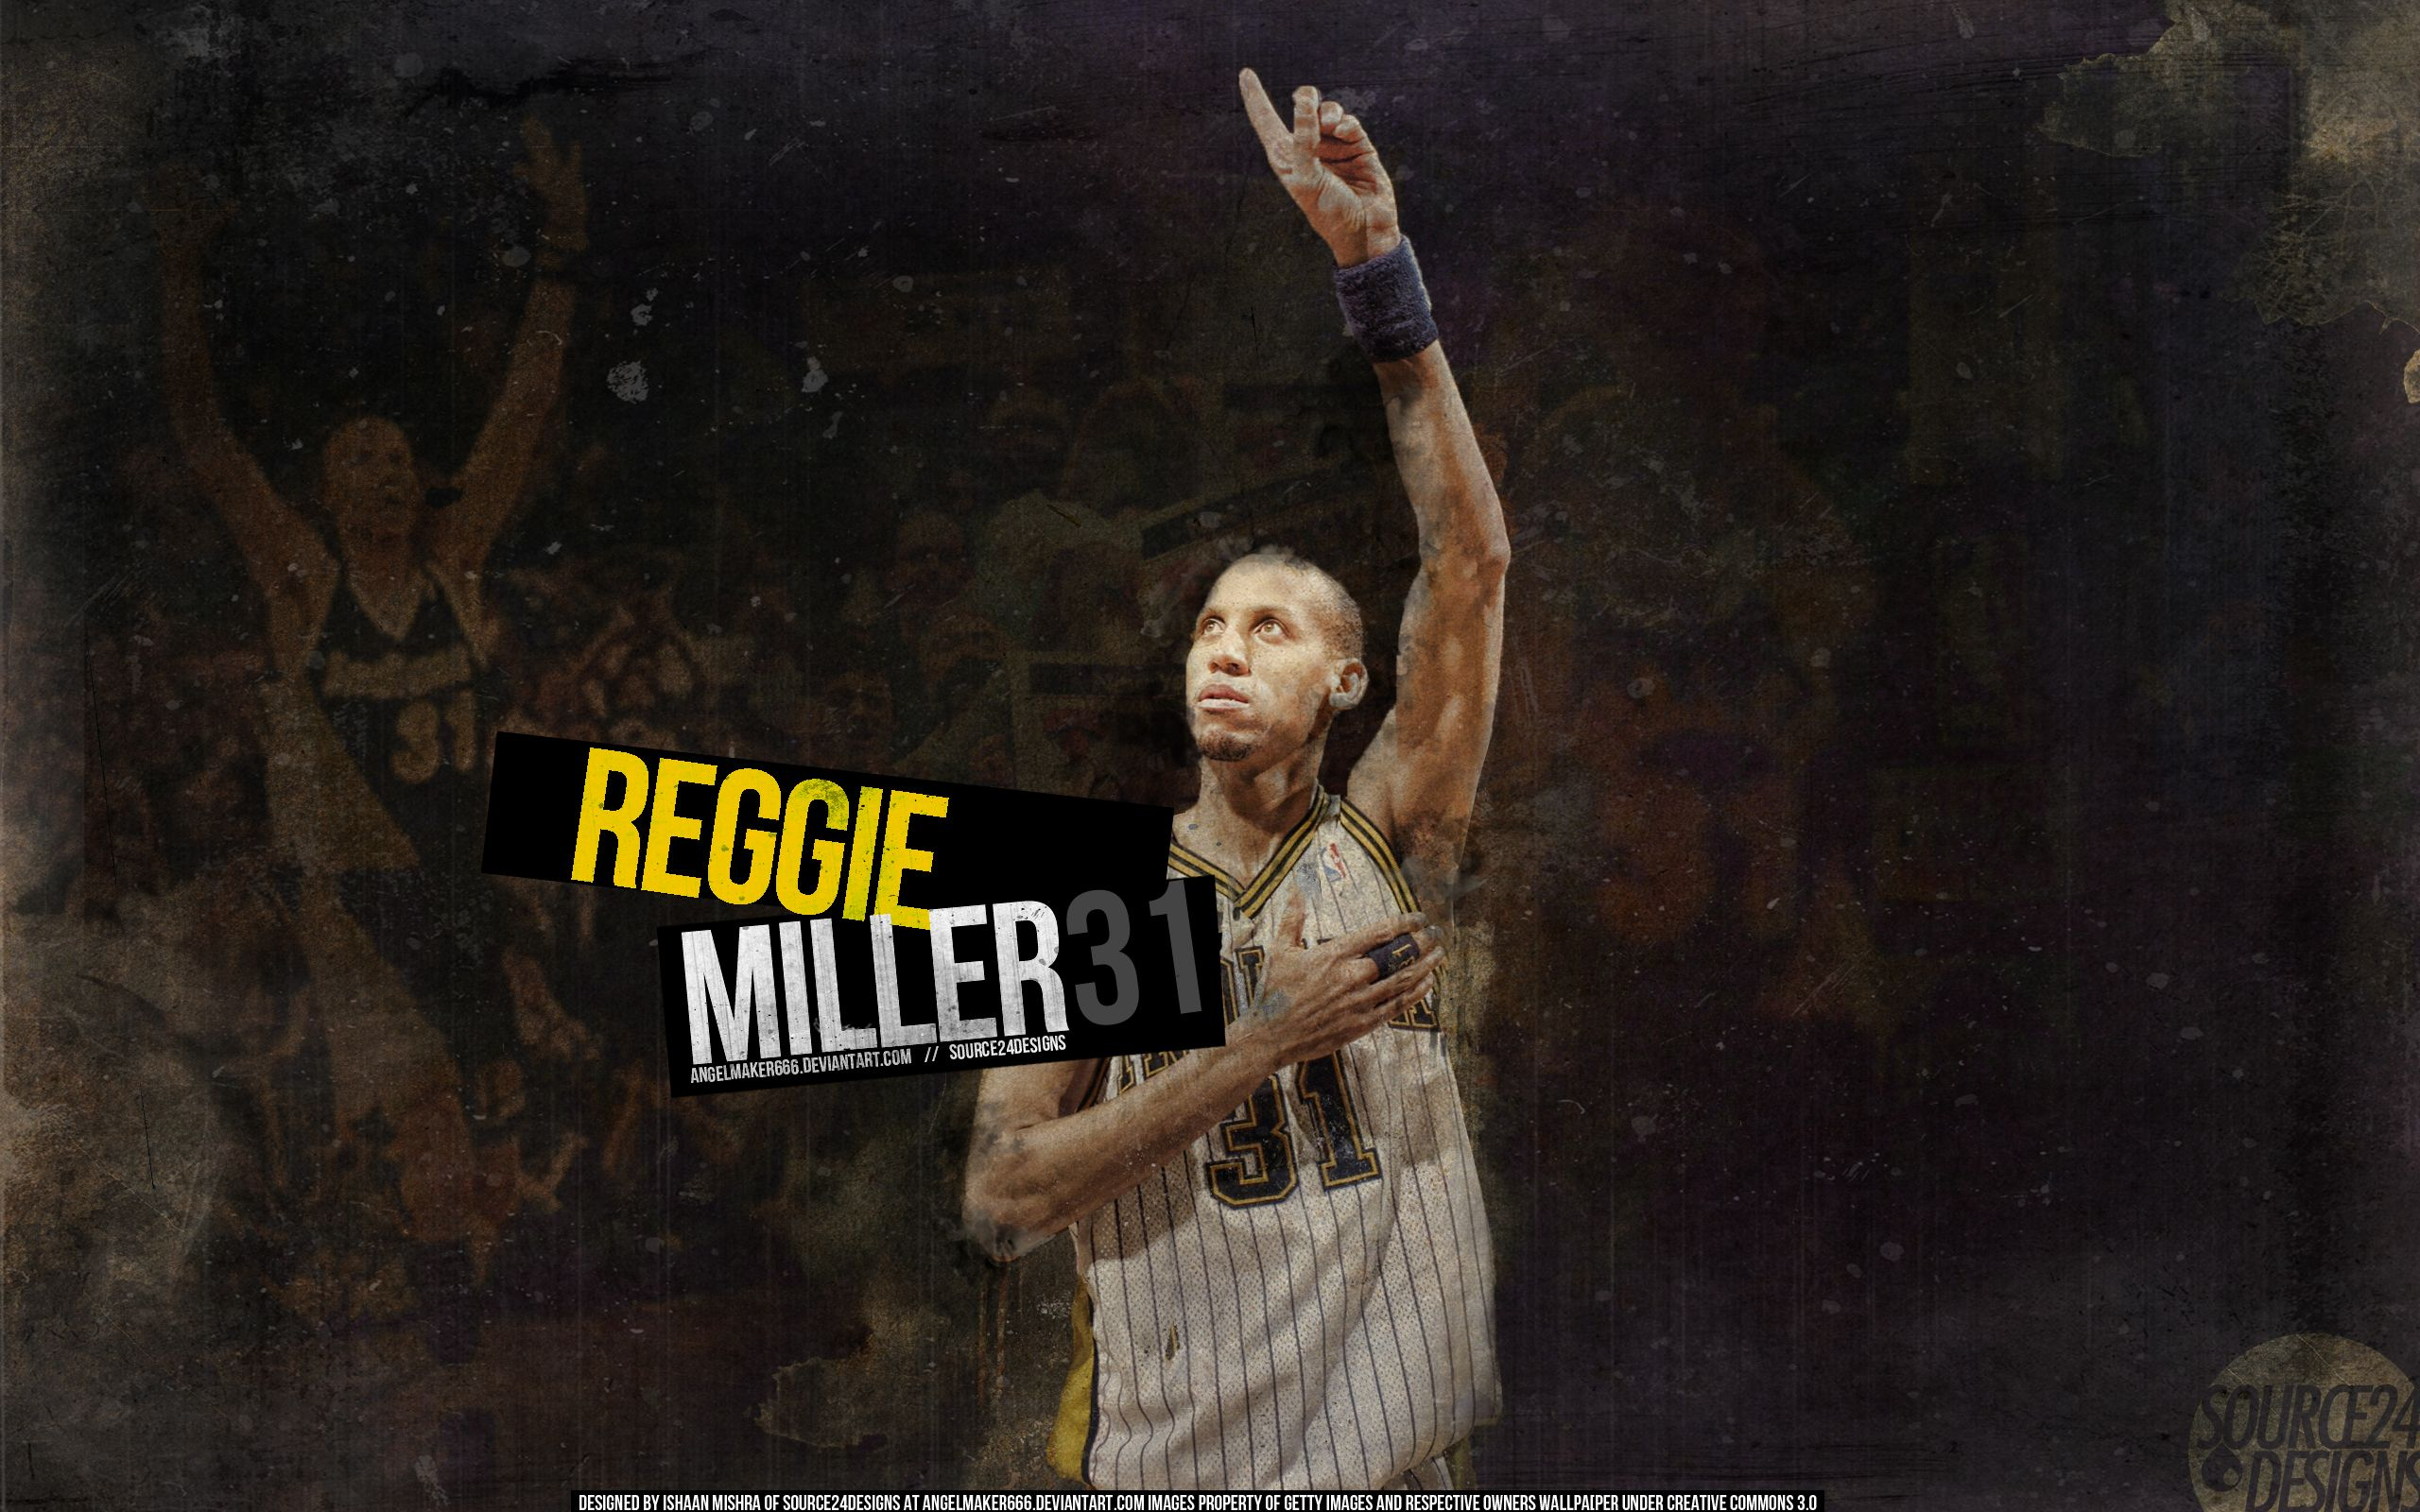 Reggie miller pacers wallpaper by angelmaker666iantart on reggie miller pacers wallpaper by angelmaker666iantart on deviantart voltagebd Images